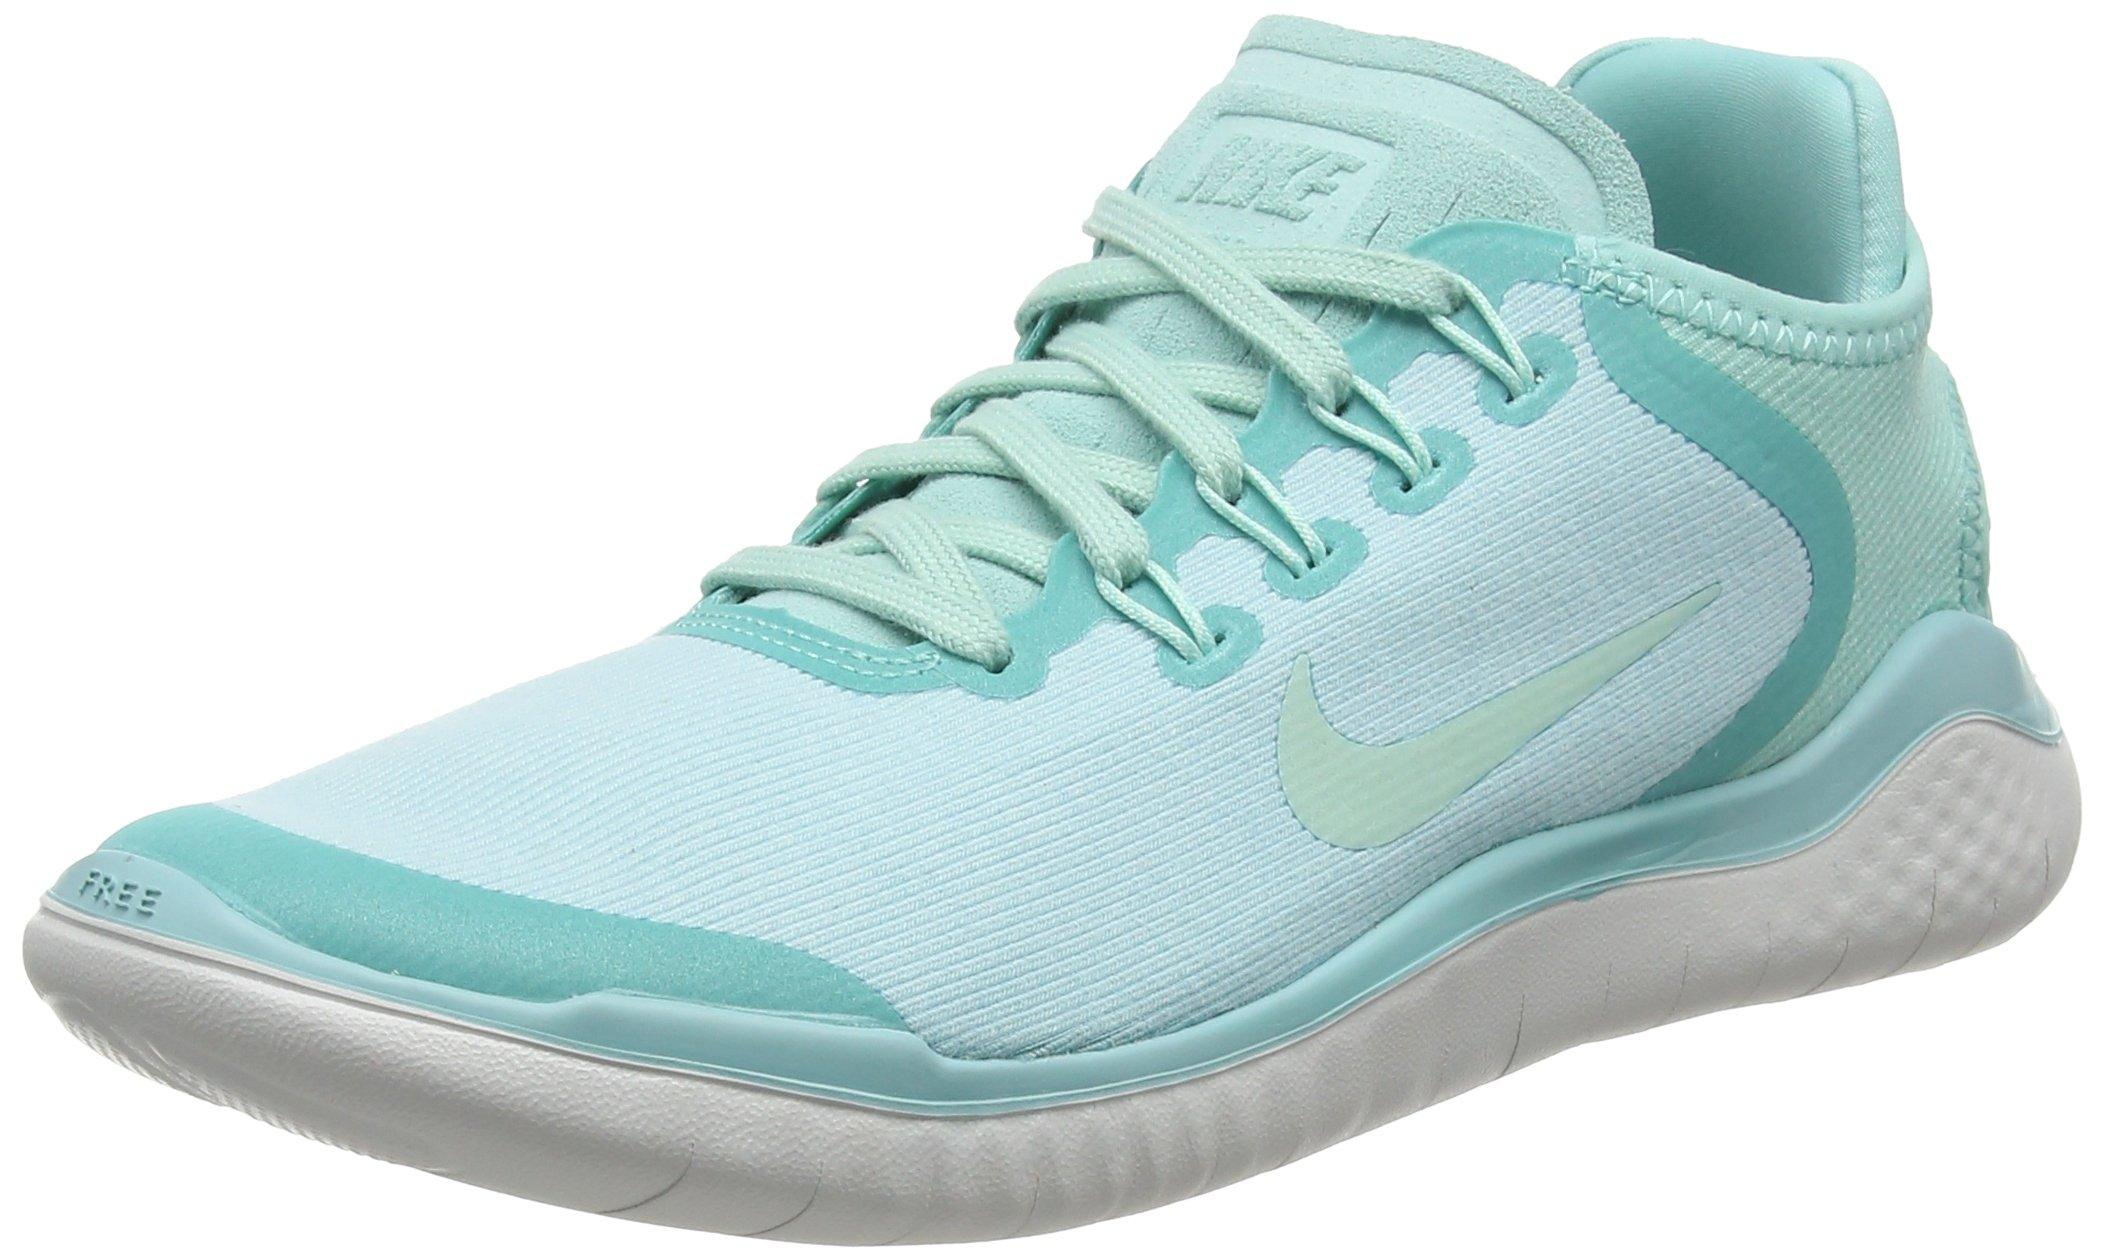 8c6581d03932 Galleon - Nike Free Rn 2018 Sun Sz 6.5 Womens Running Island Green Igloo-Vast  Grey Shoes